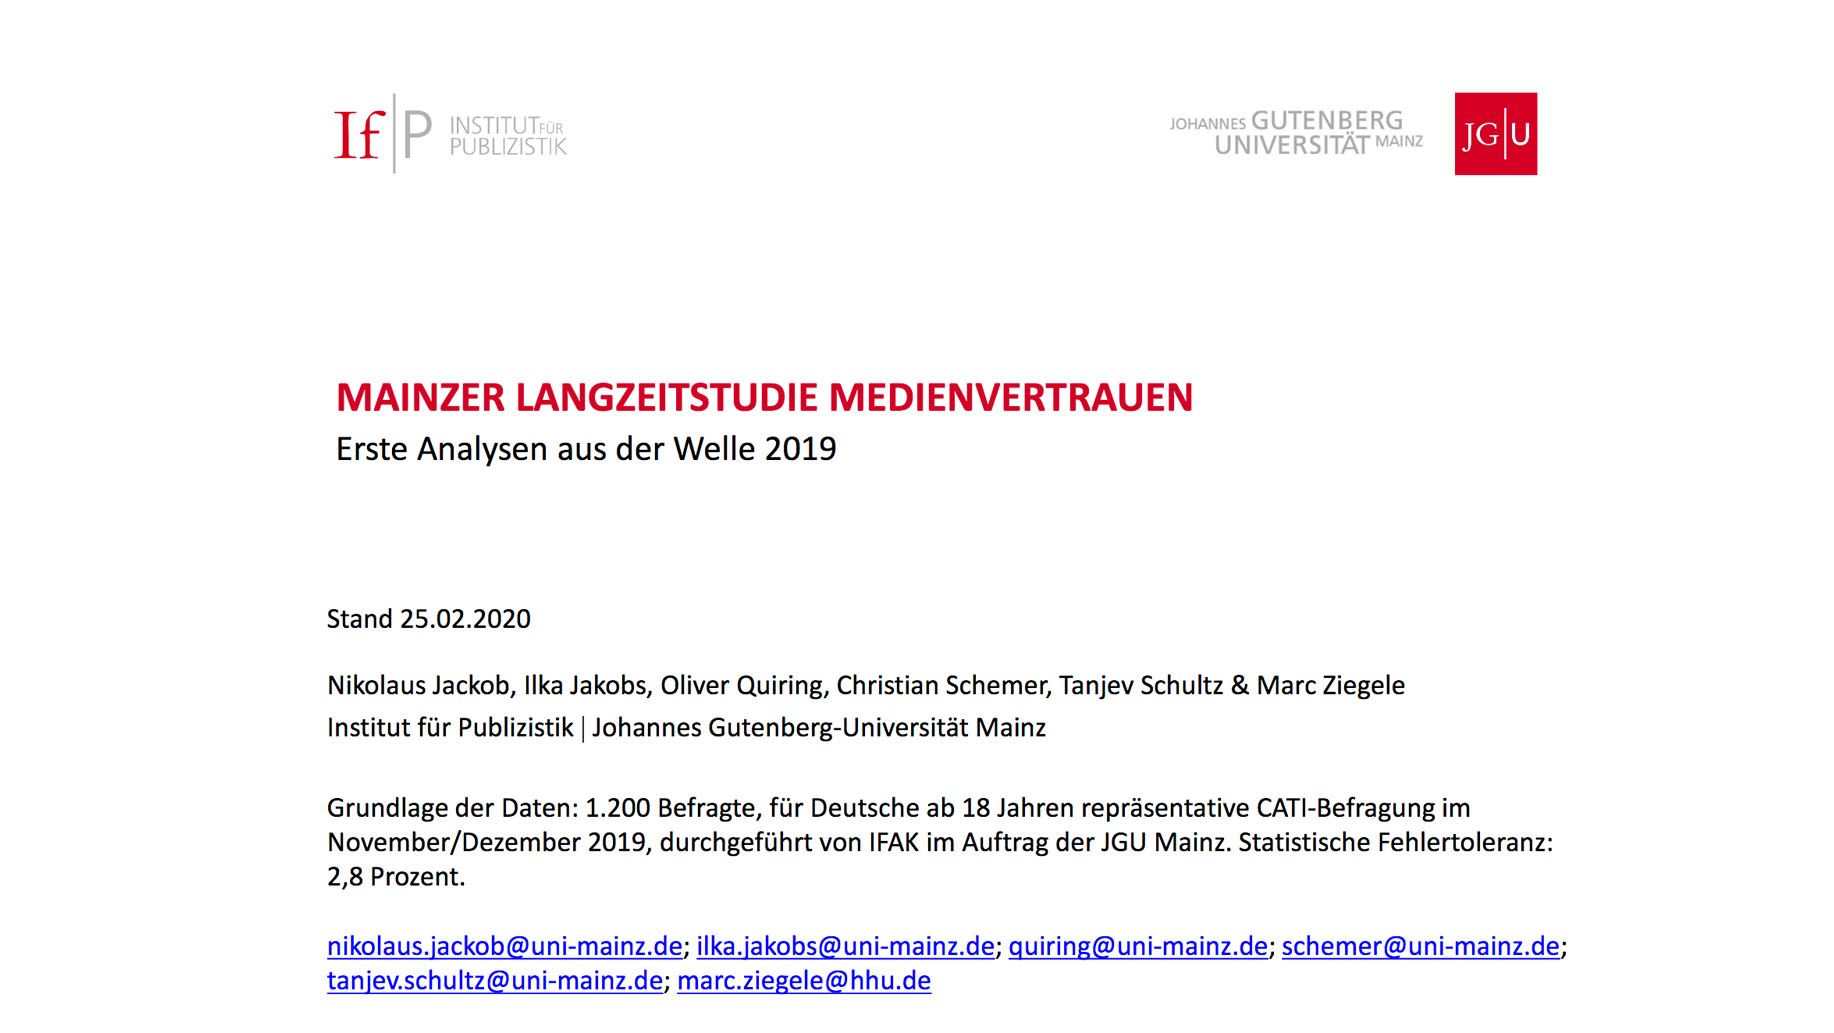 langzeitstudie-2020-2